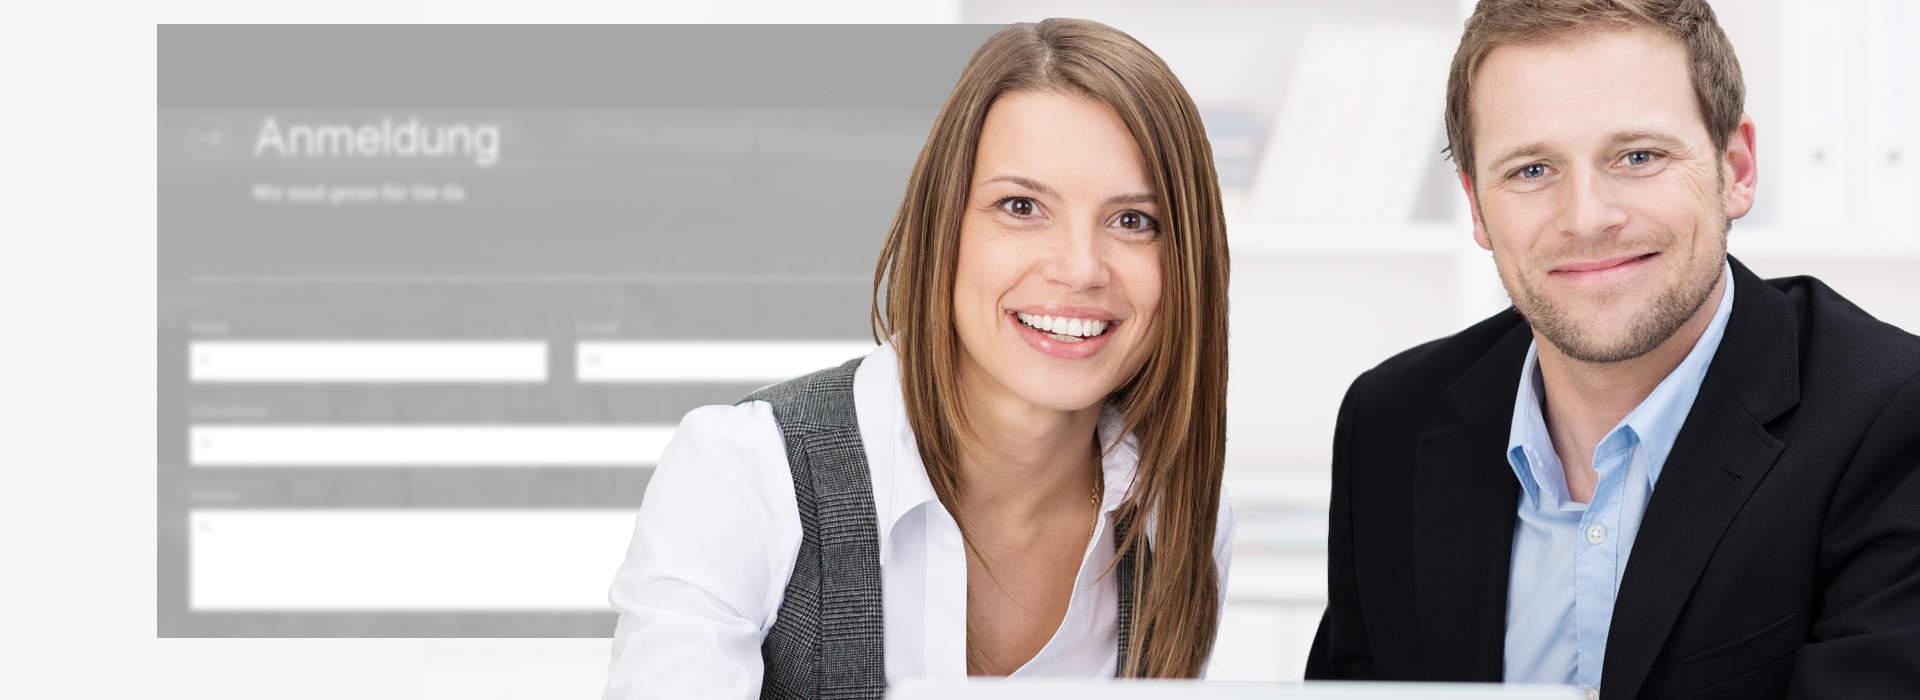 TRINOM Web2Print - Brand Management